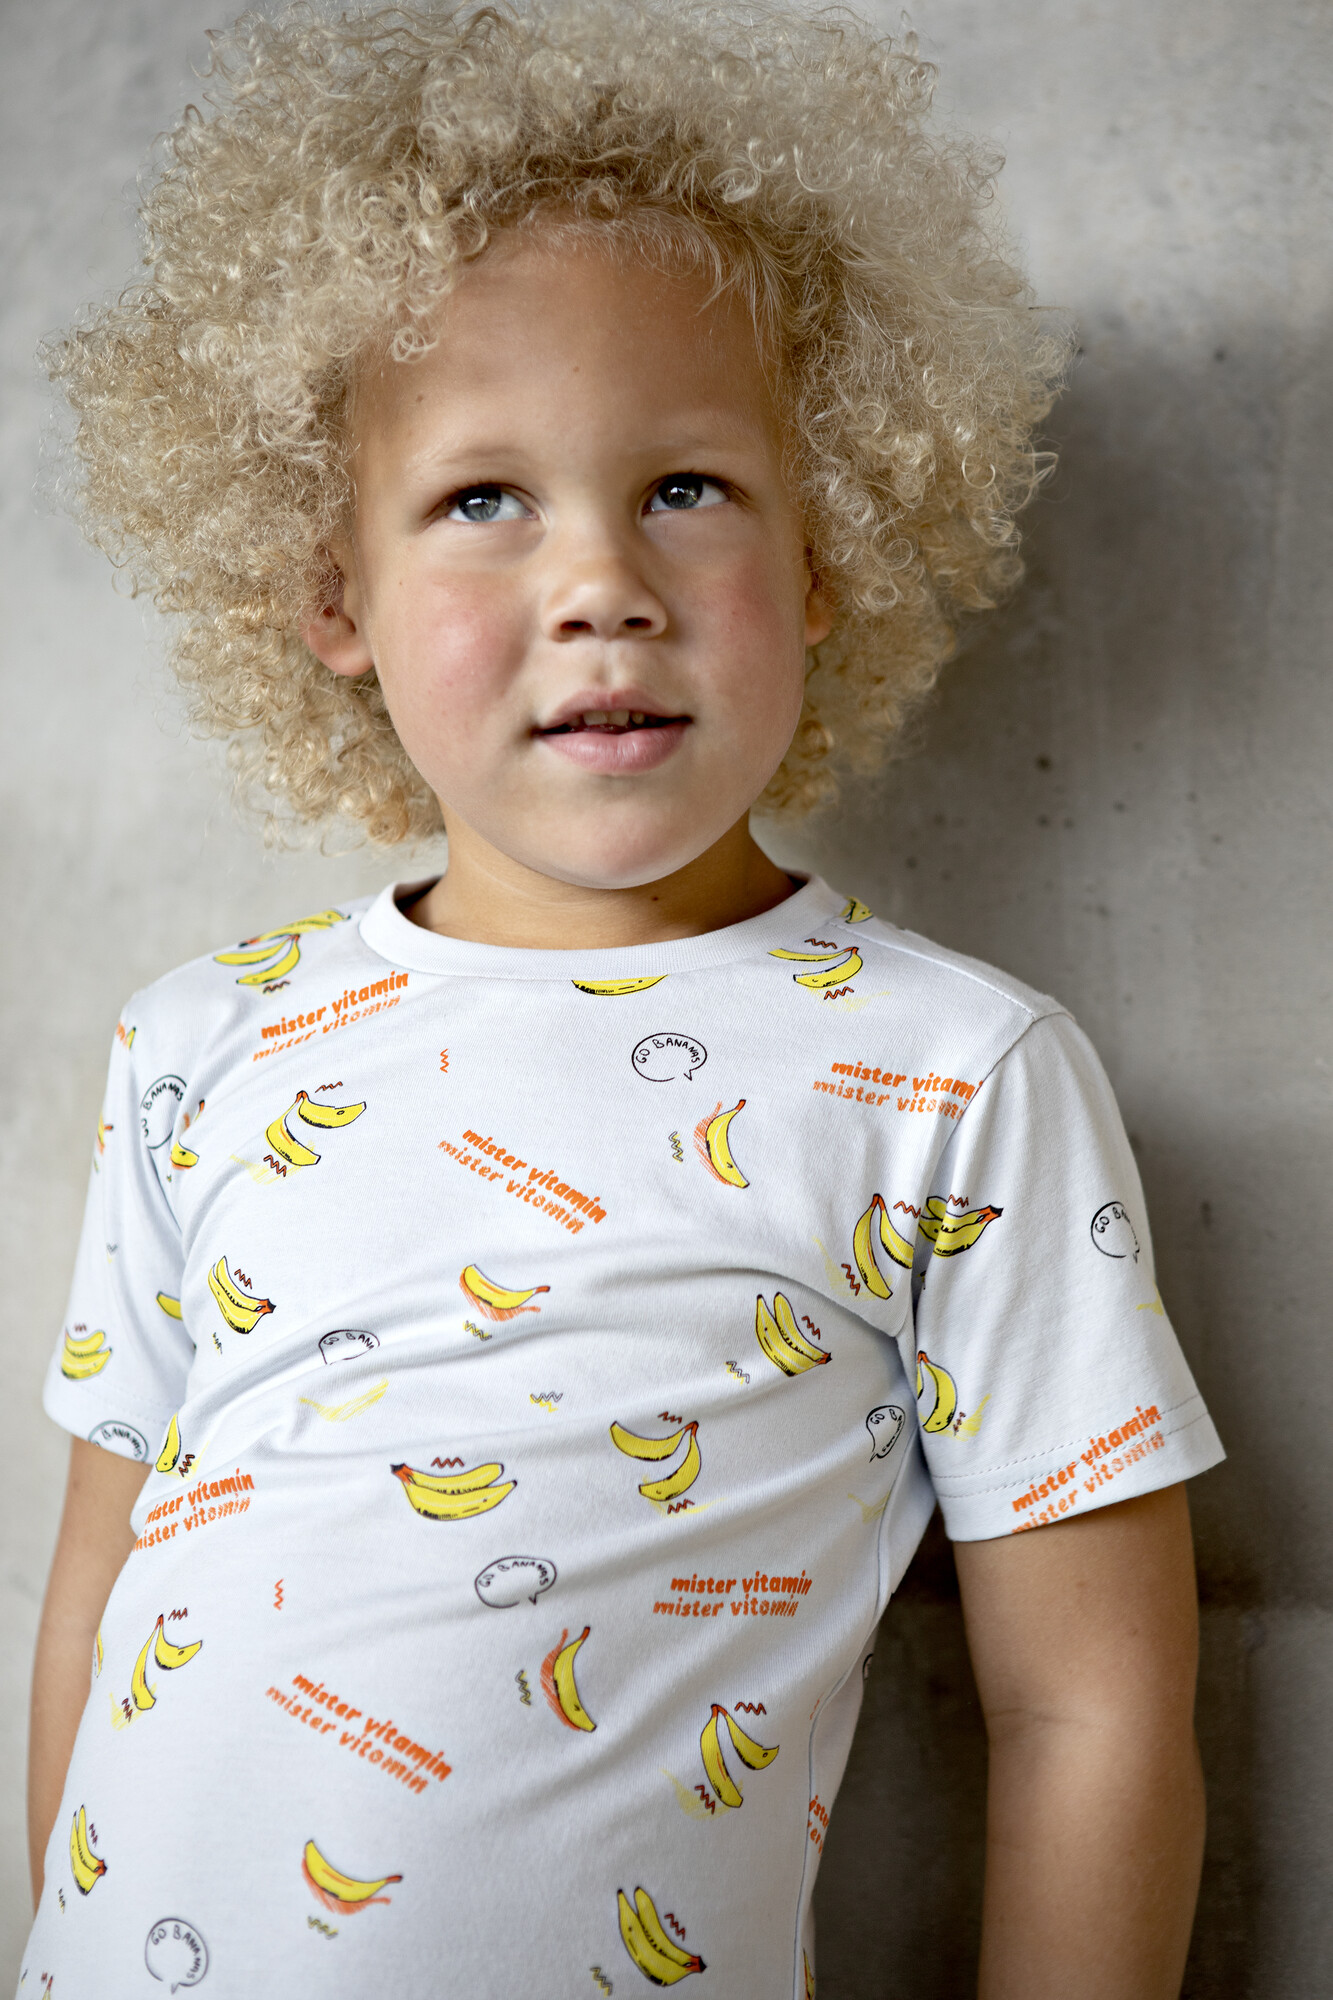 Mini Rebels : blond jongetje met t-shirt met leuke print.